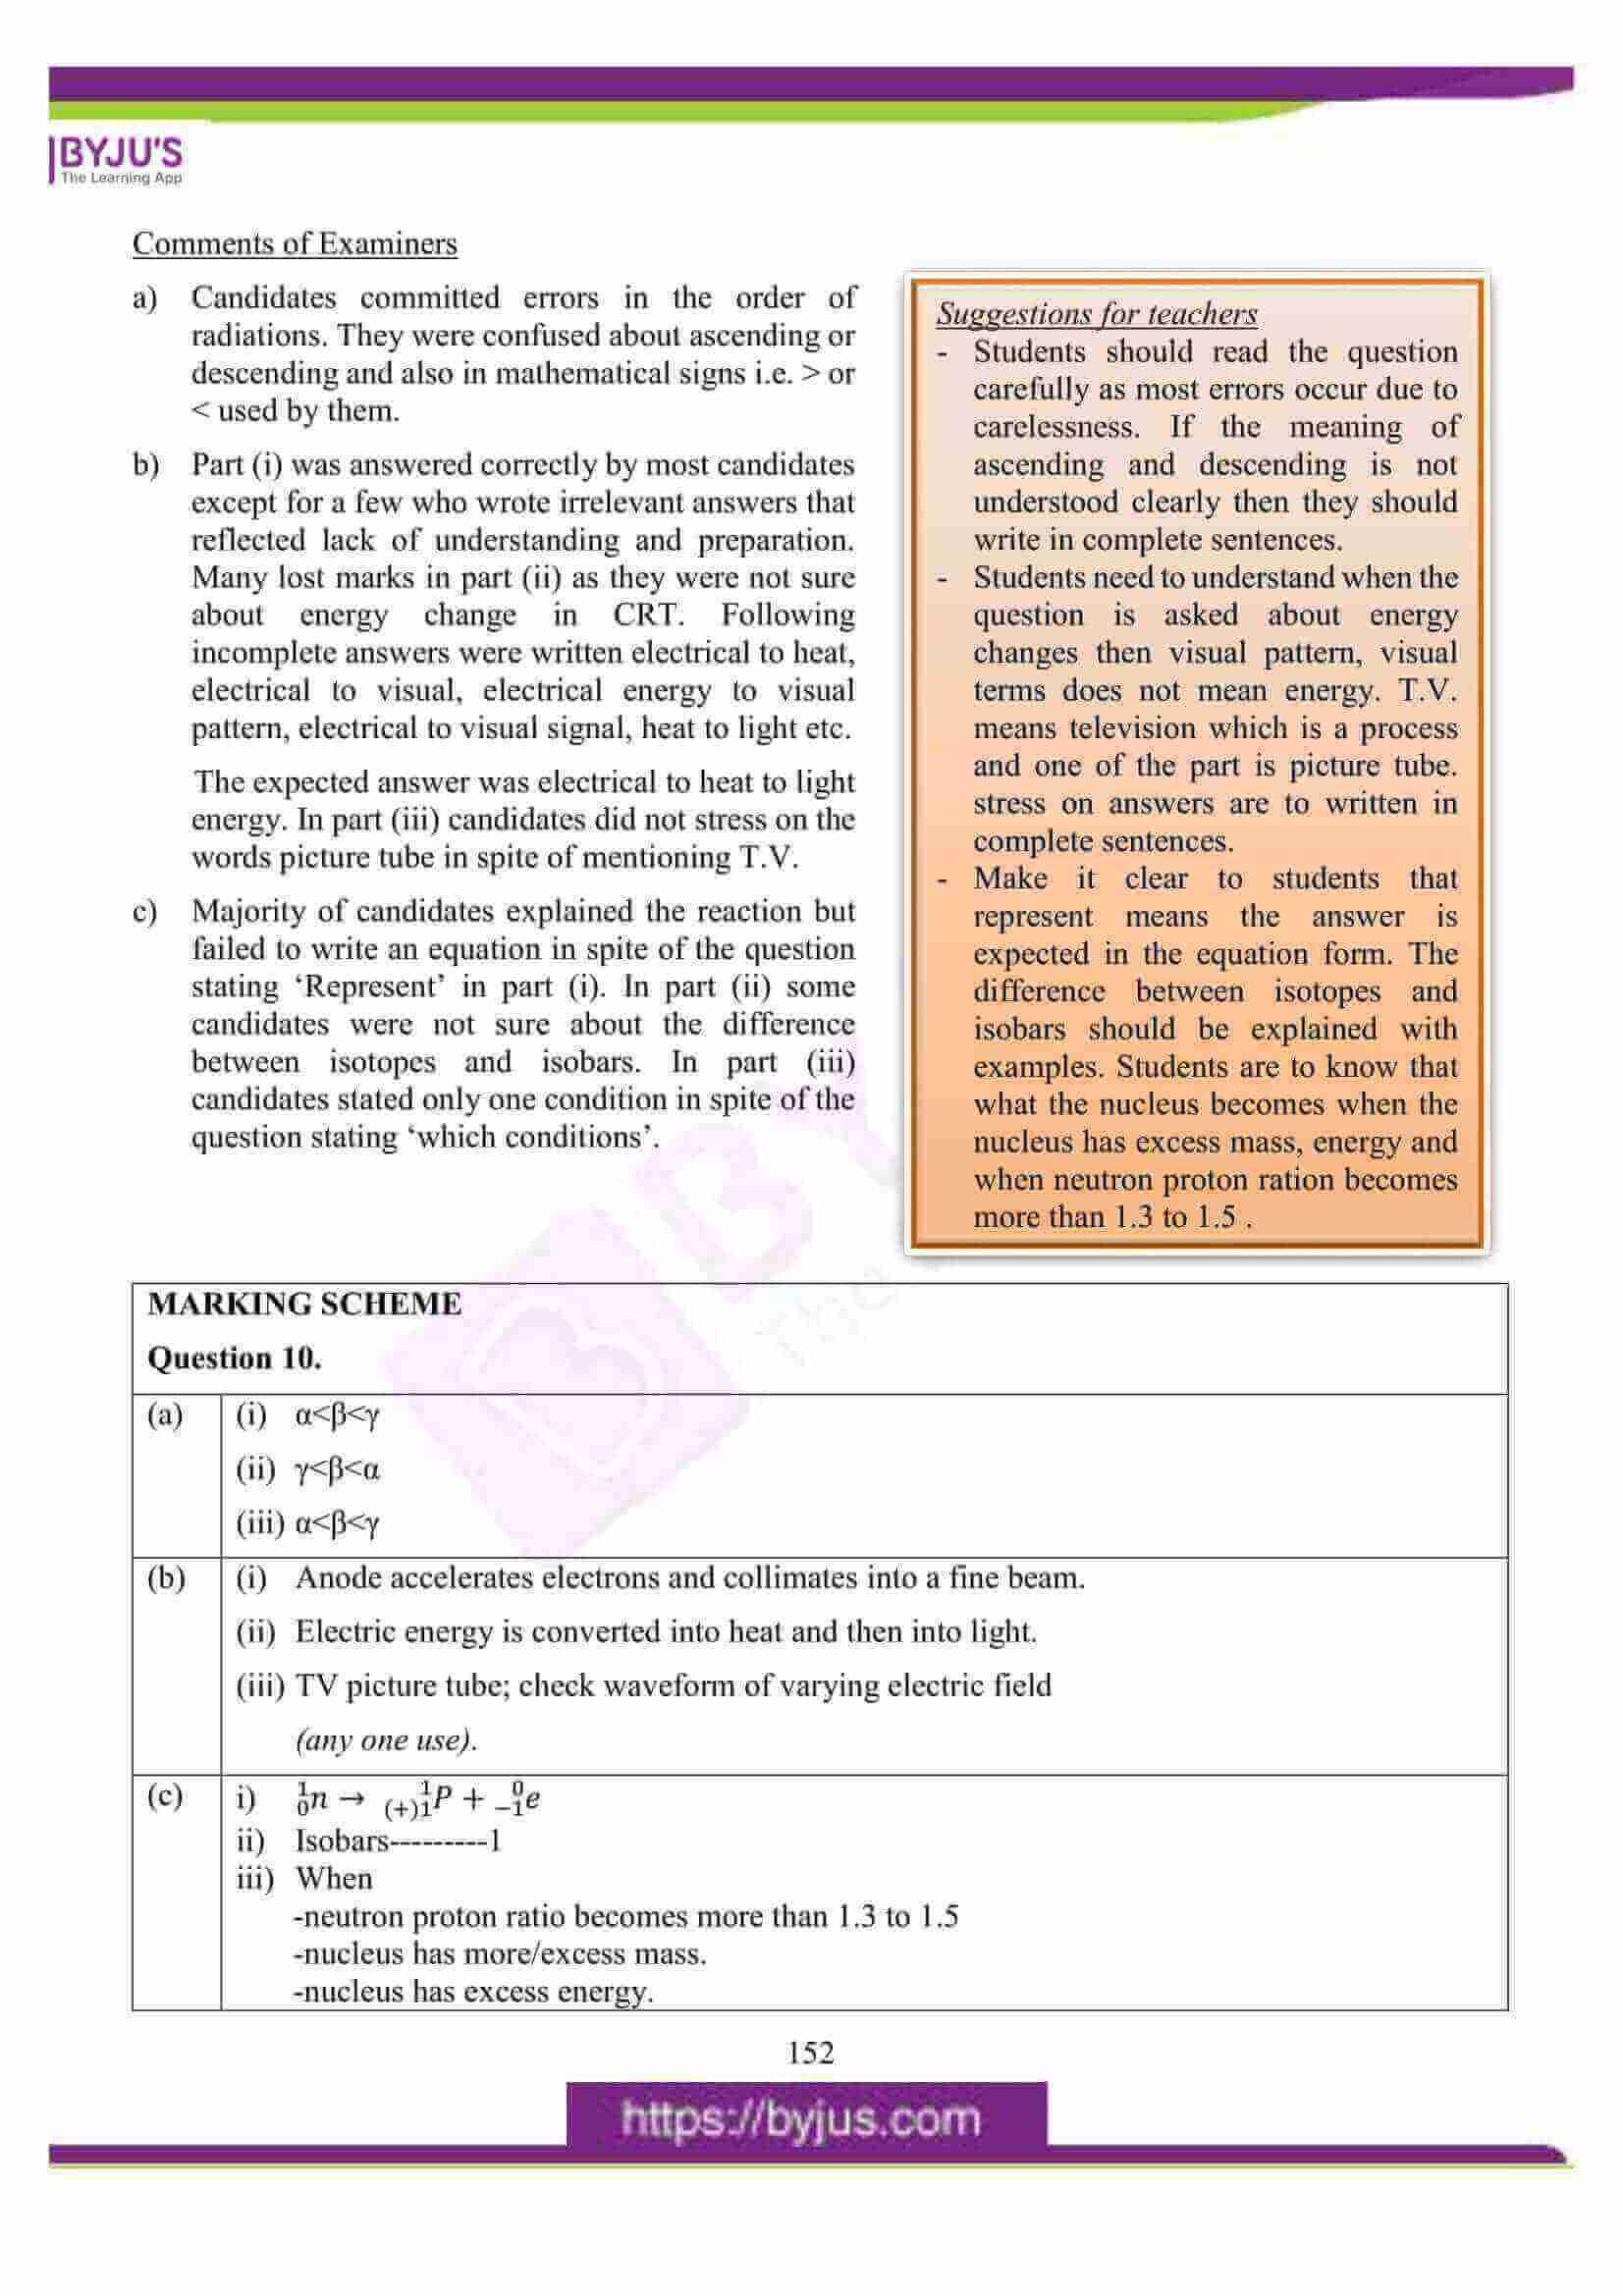 icse class 10 physics question paper solution 2016 17